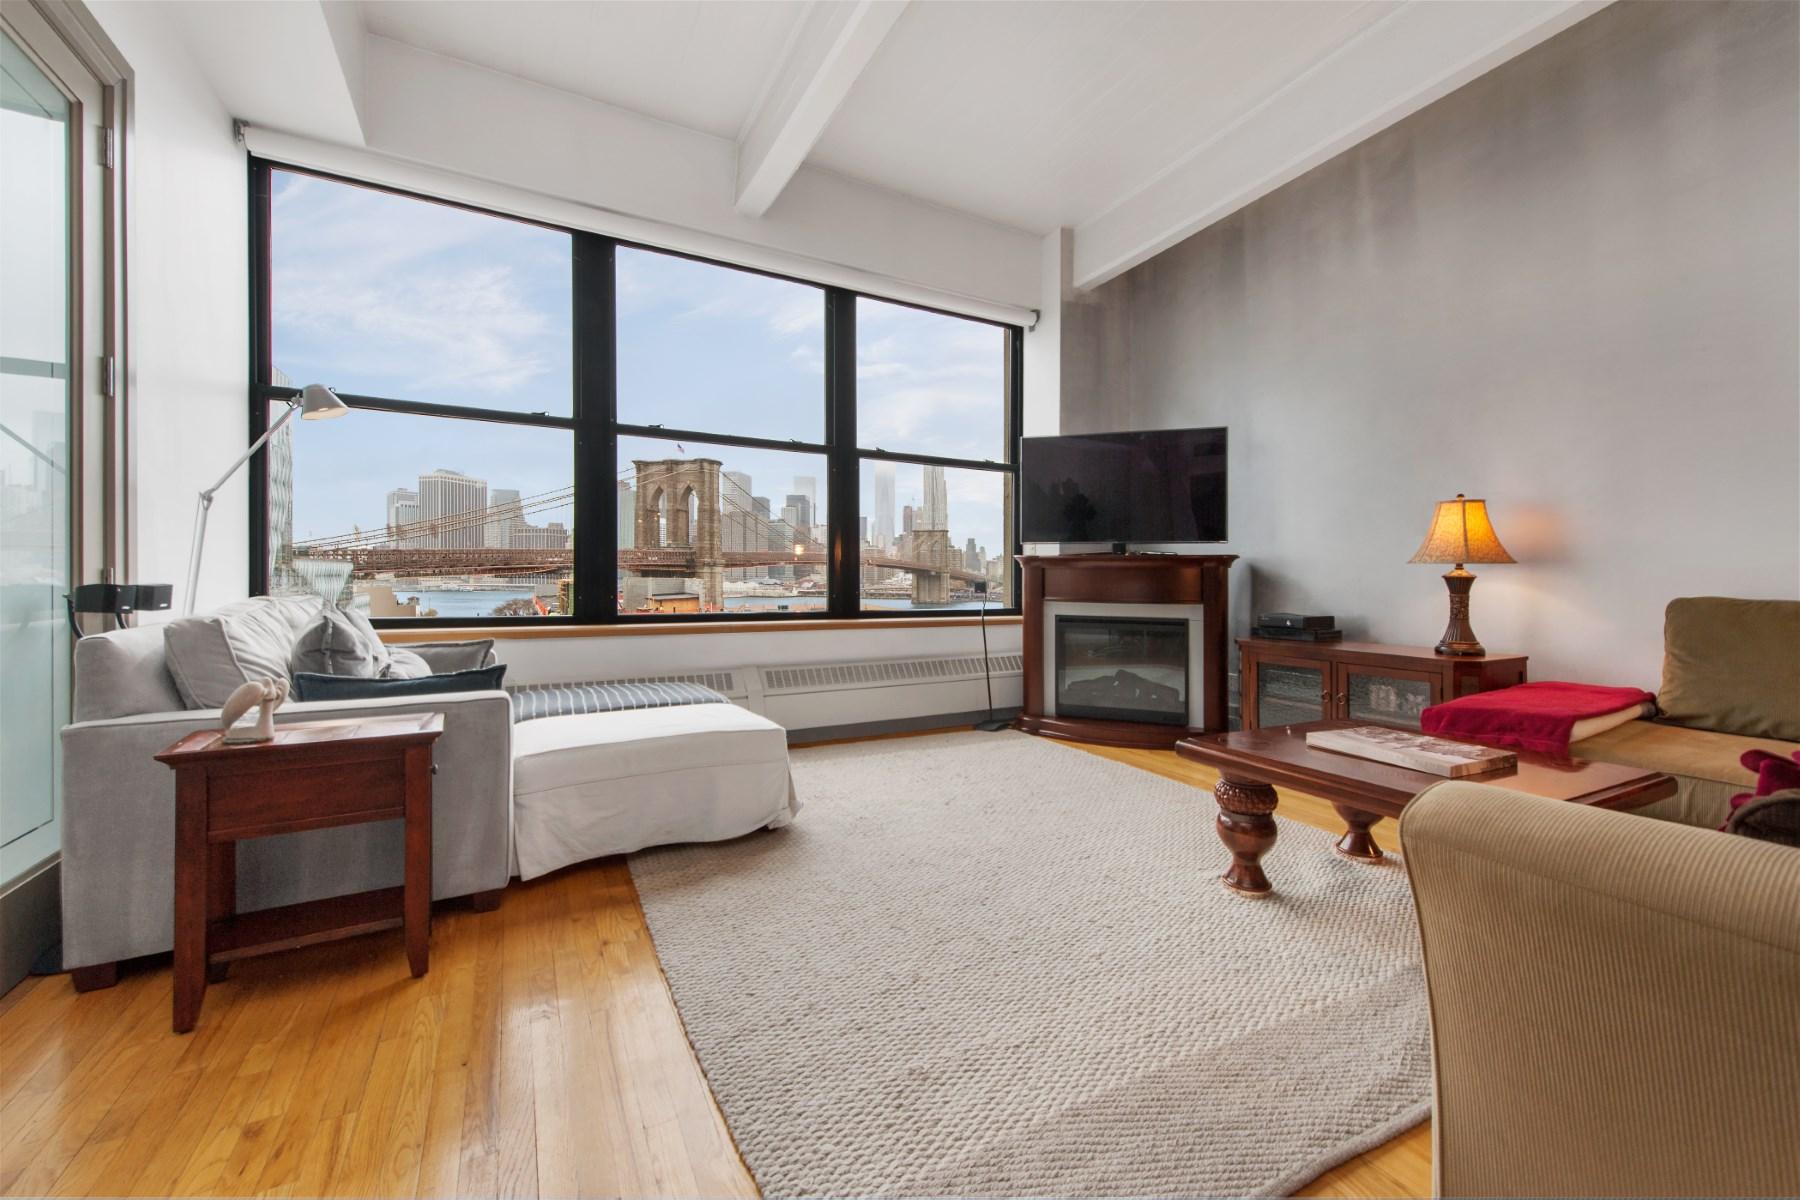 Property For Sale at Stunning Brooklyn Bridge Views